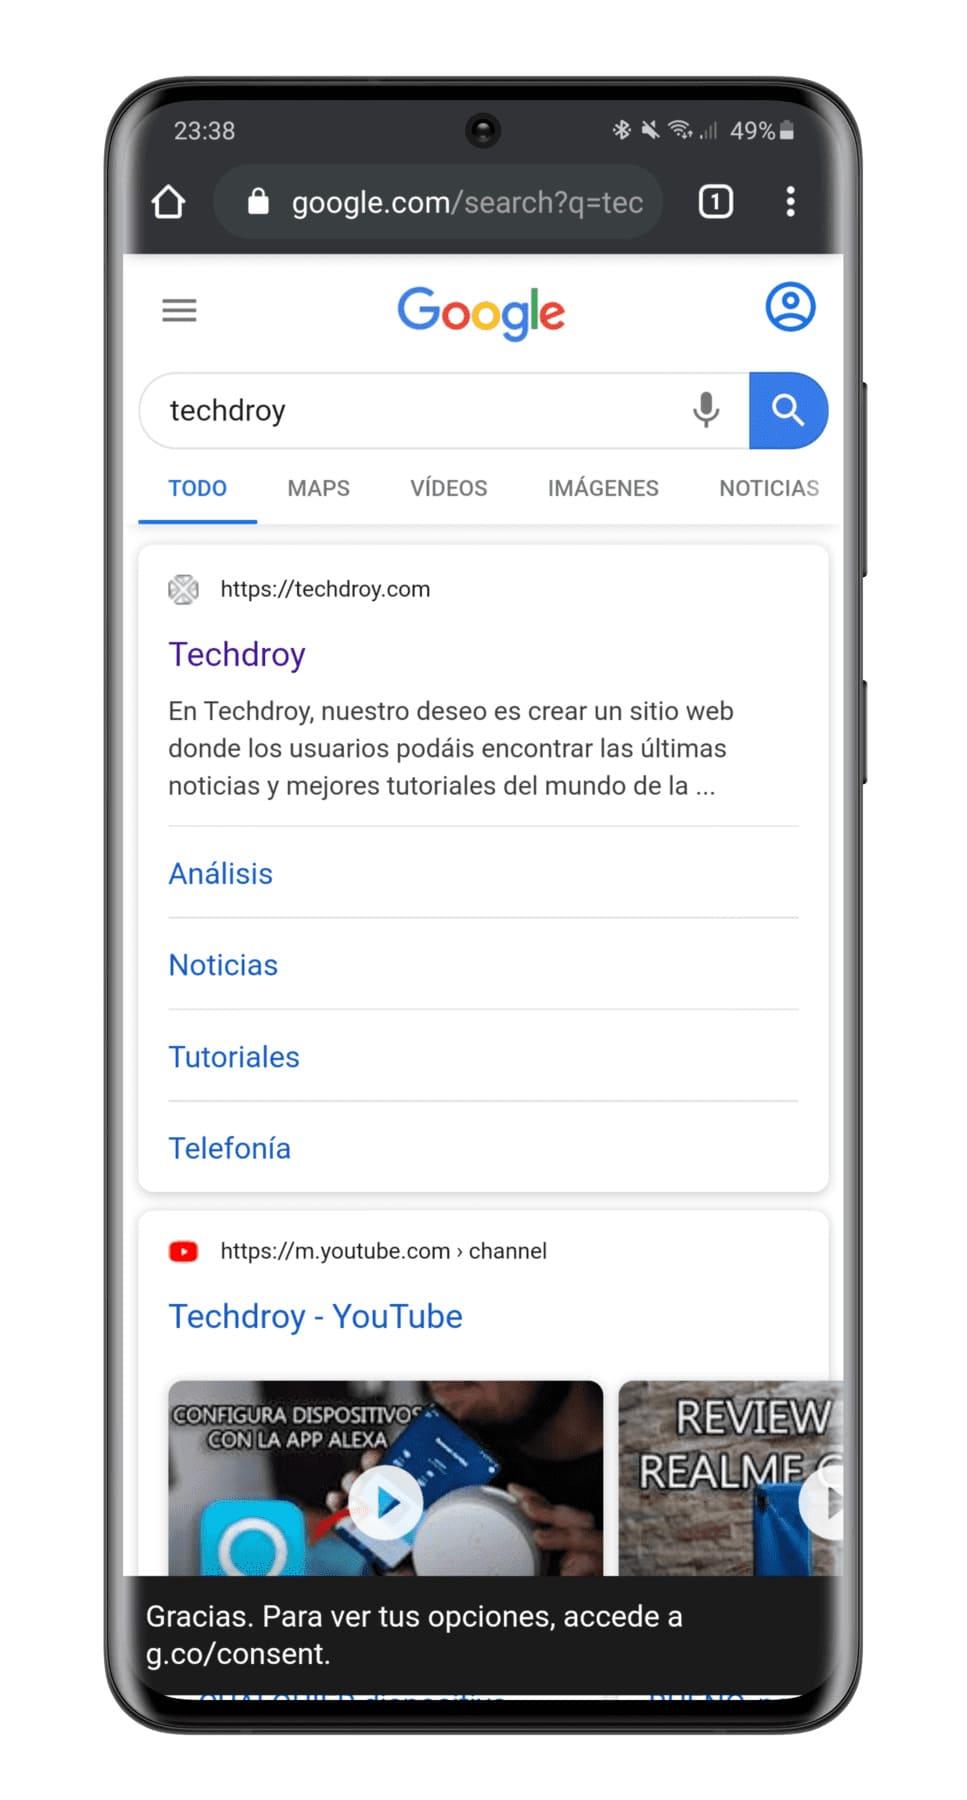 diseño-resultados-Google-mobile-Techdroy